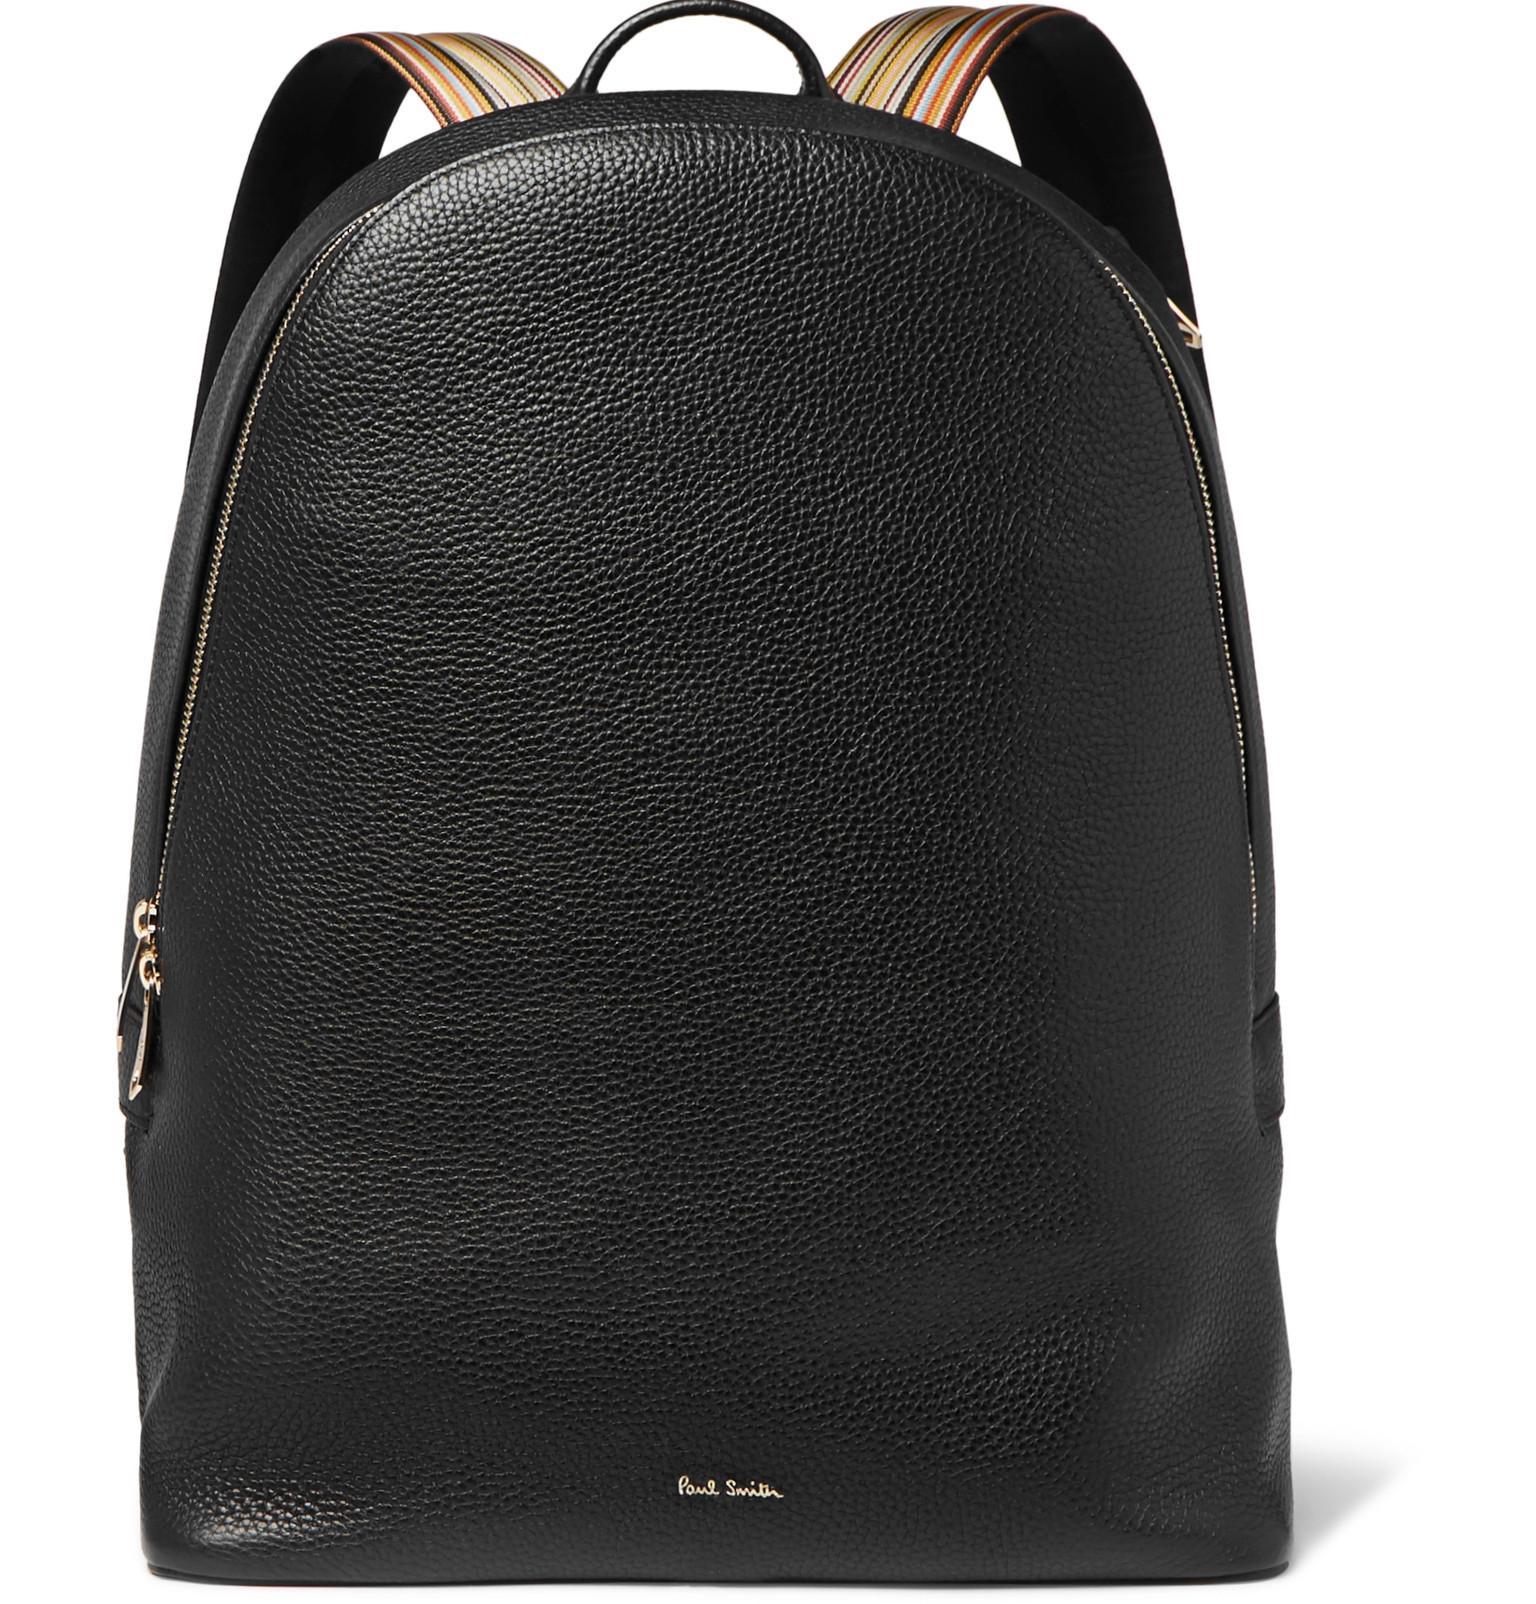 Full-grain Leather Backpack Paul Smith Y6r8yVJc